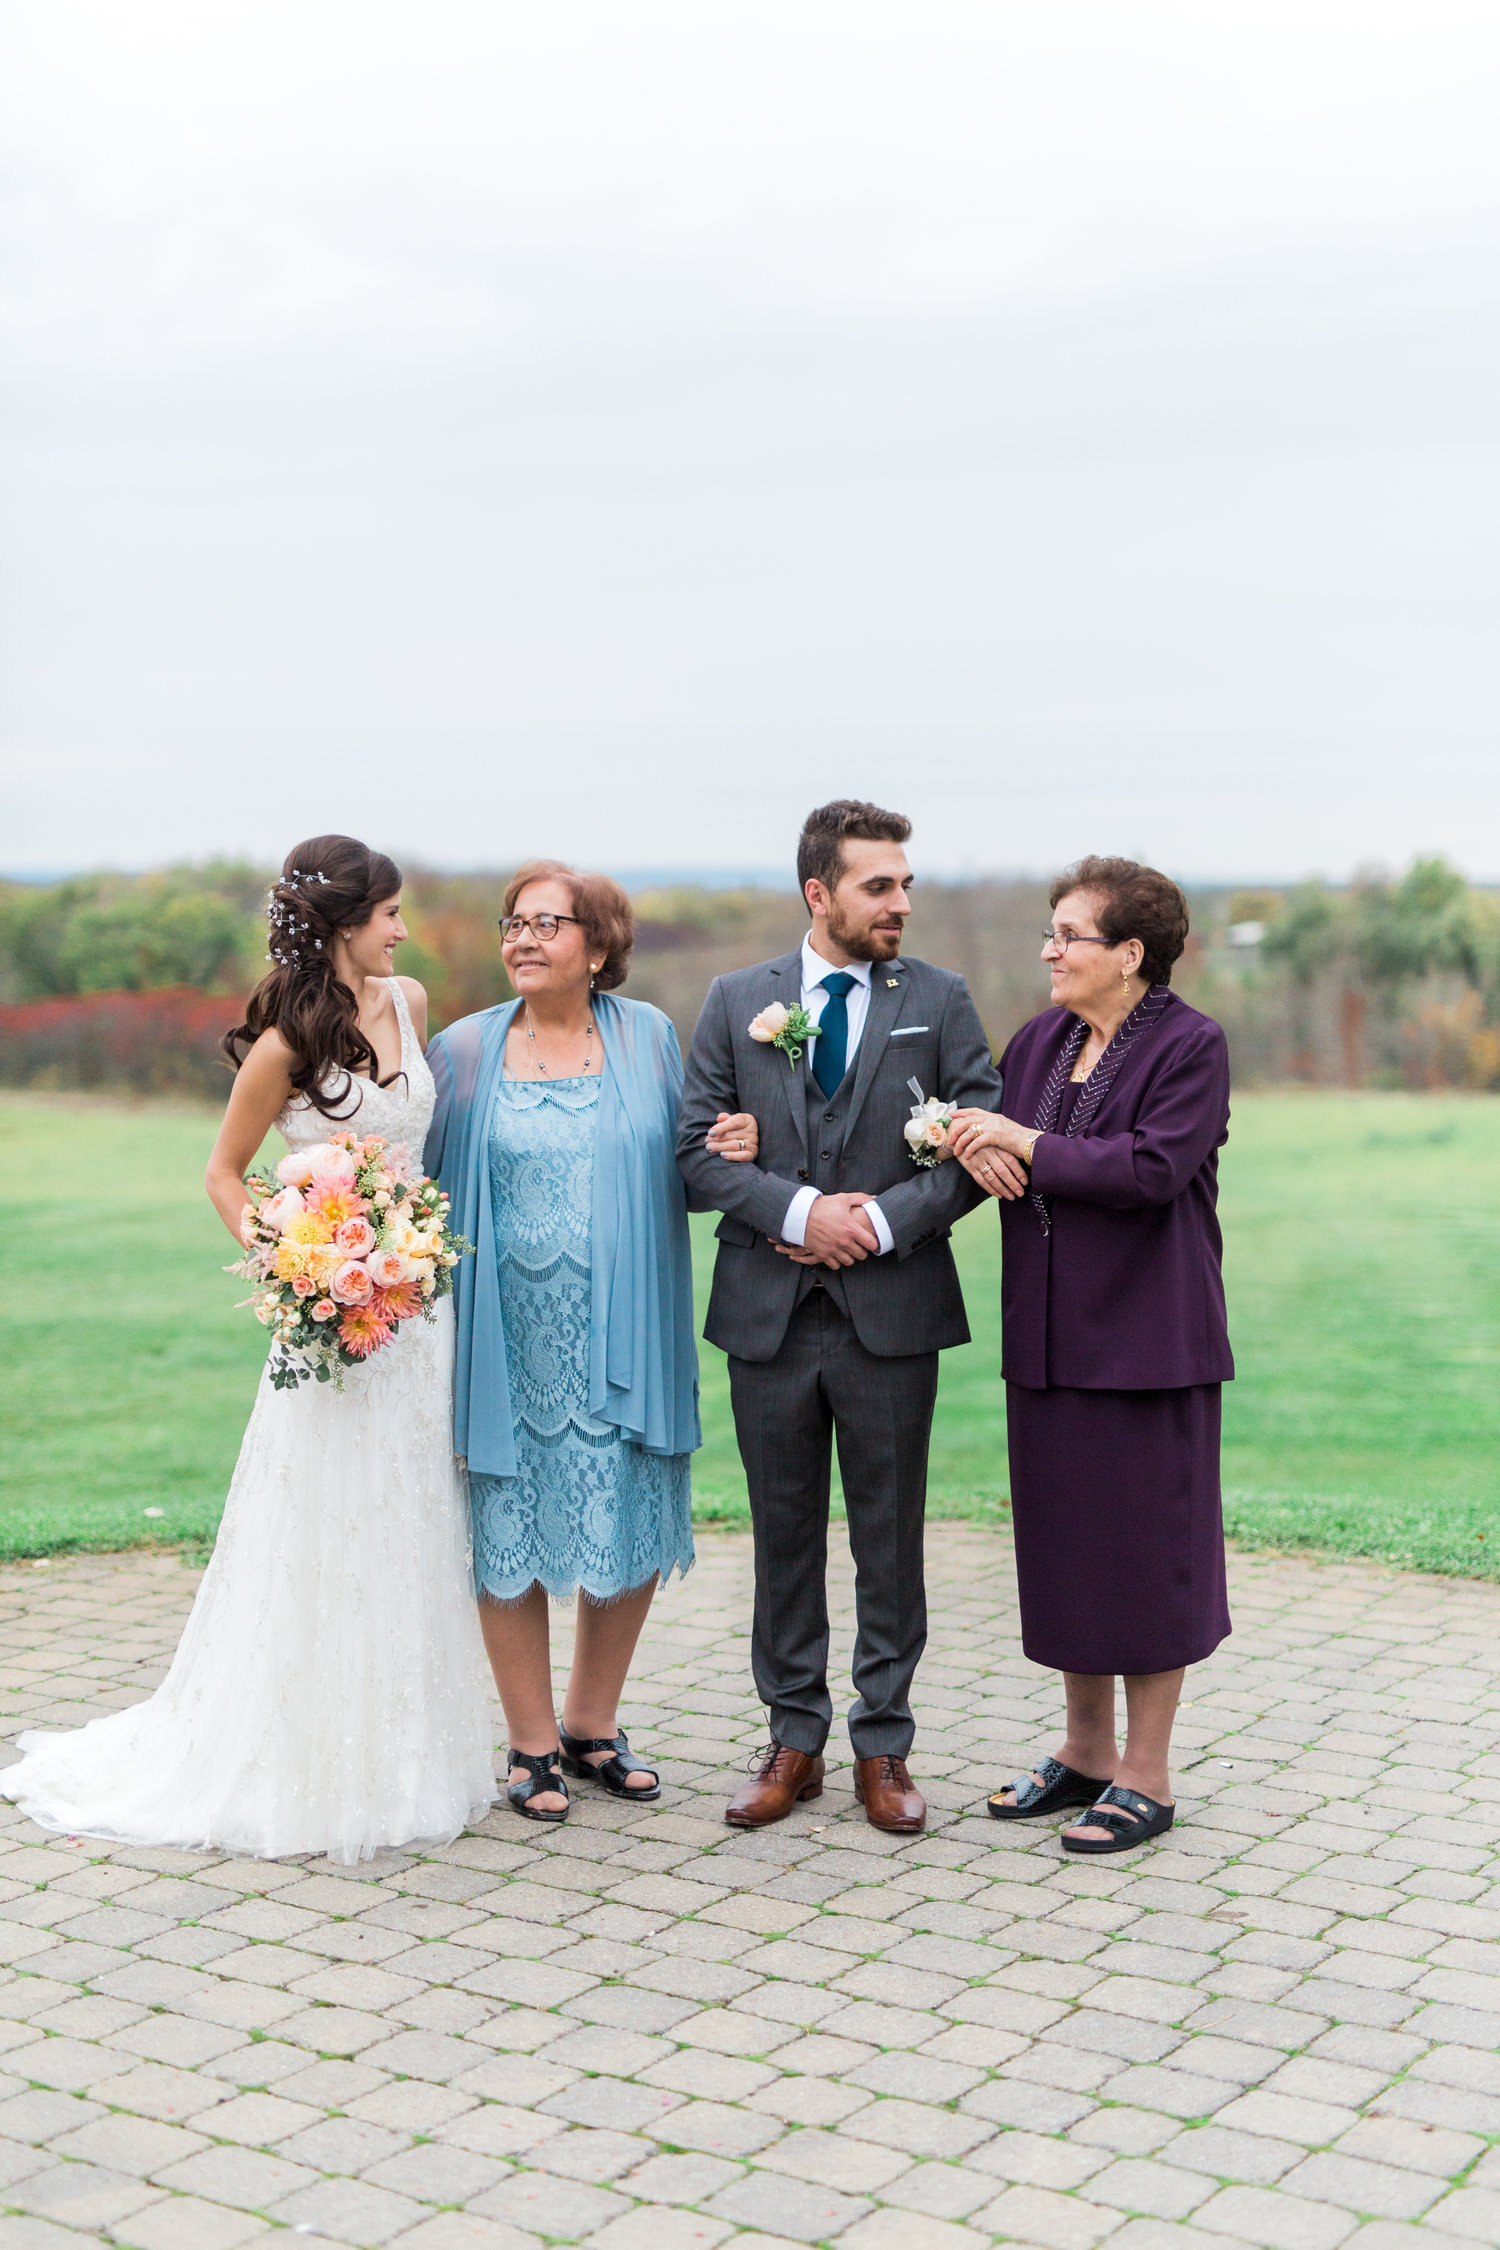 Amir-Golbazi-Danielle-Giroux-Photography_Toronto-Wedding_Cedarwood_Rachel-Paul_349.jpg